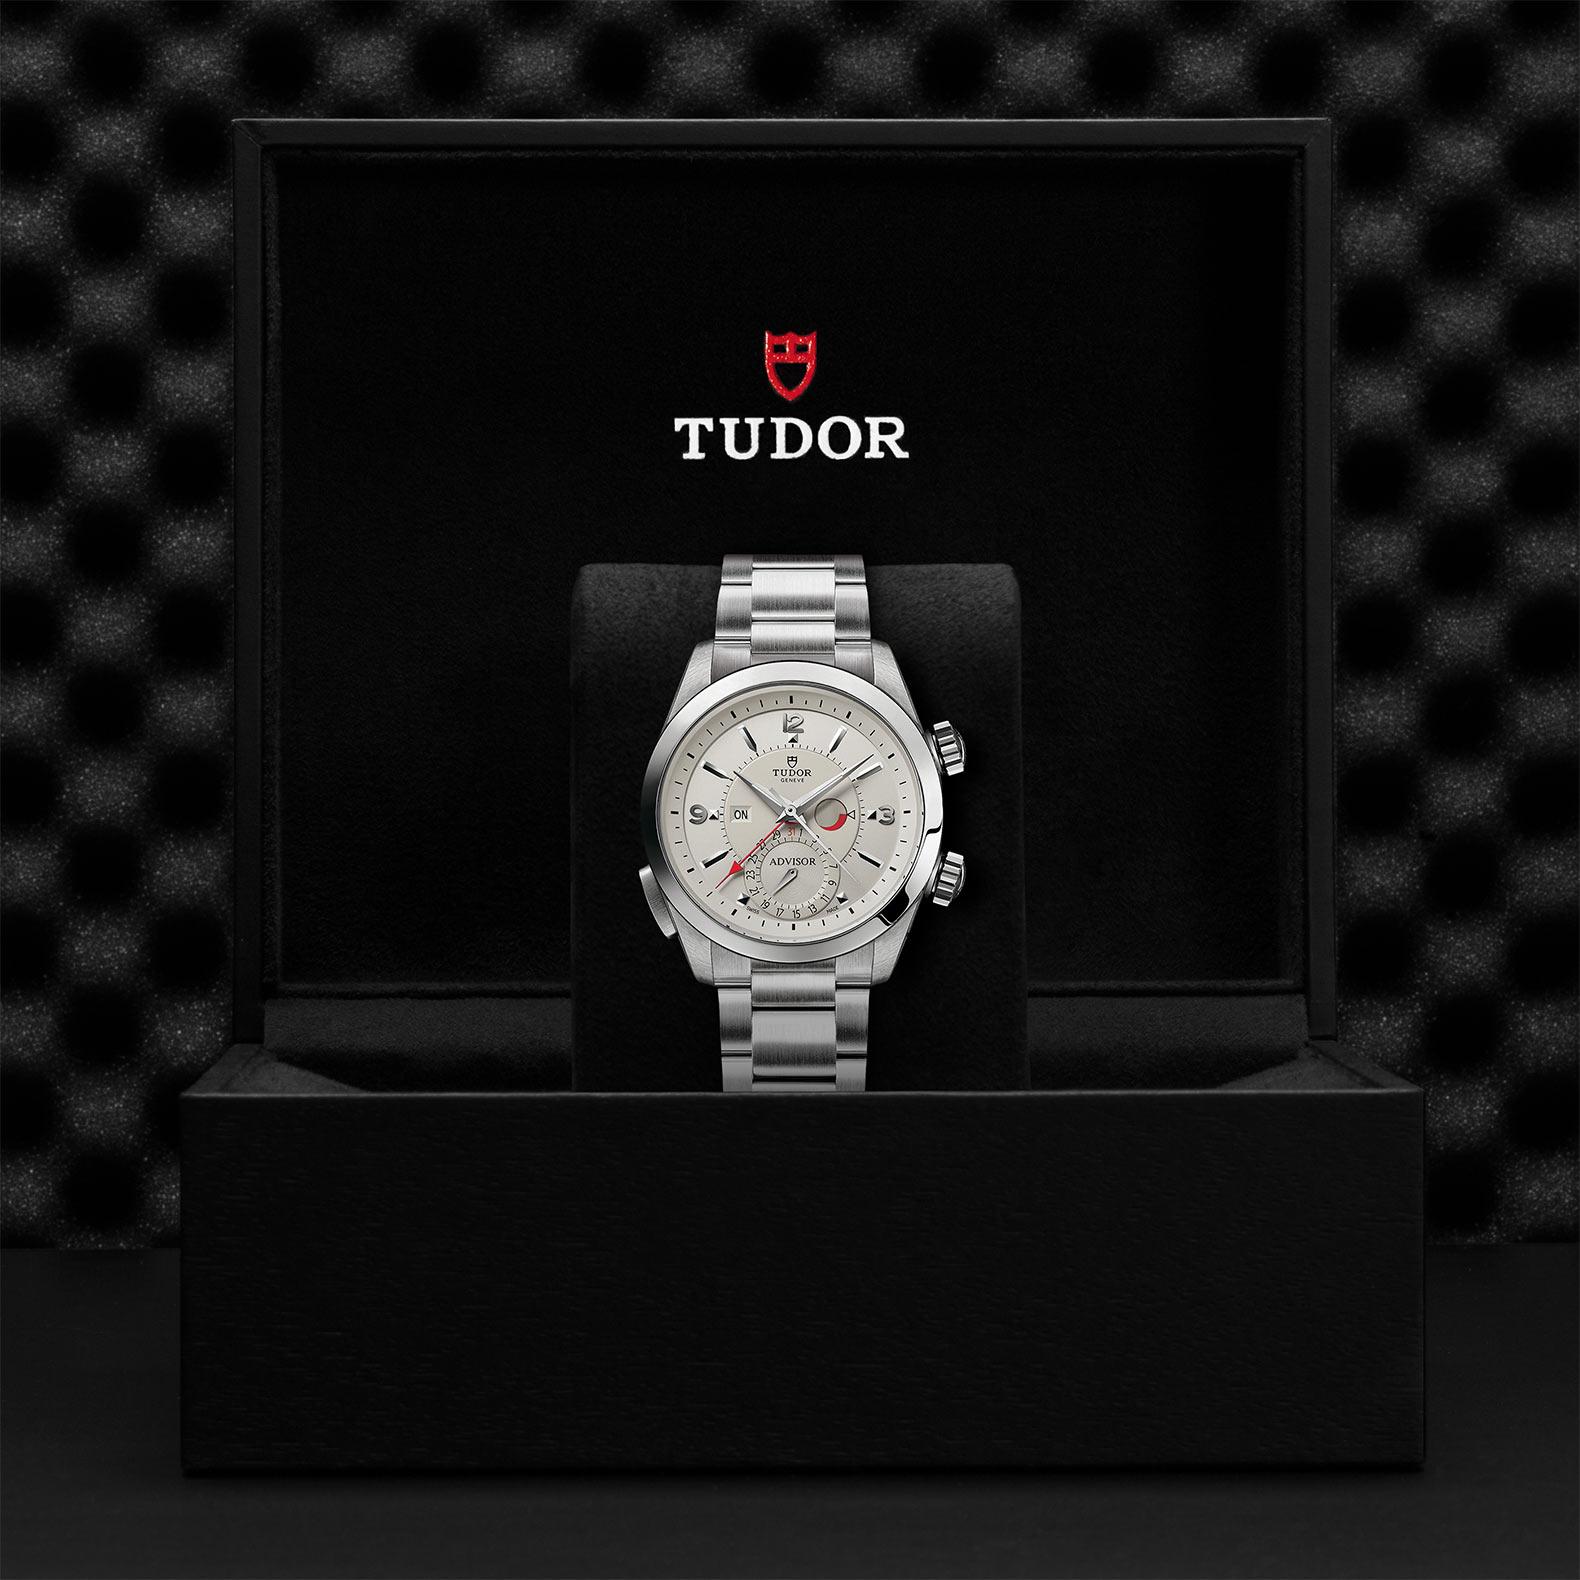 TUDOR Heritage Advisor M79620T 0010 Presentationbox